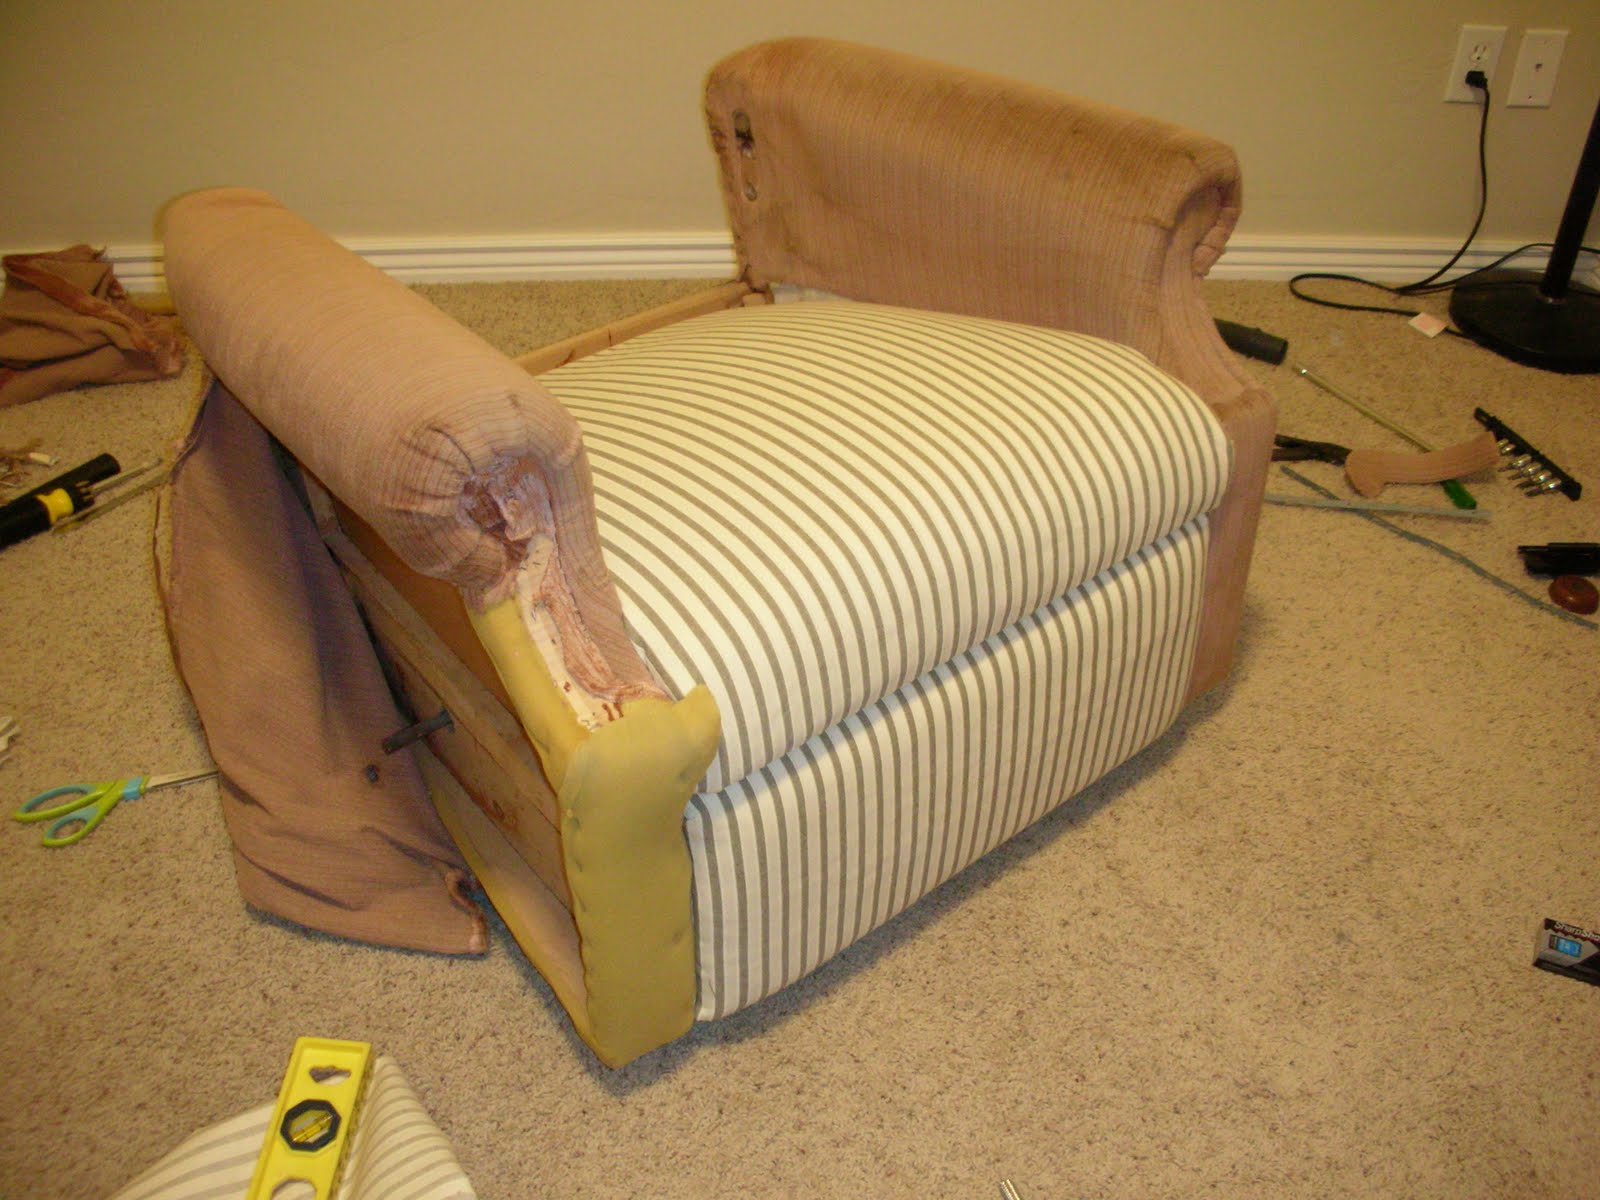 reupholster leather sofa diy modesto table do it yourself divas an old la z boy